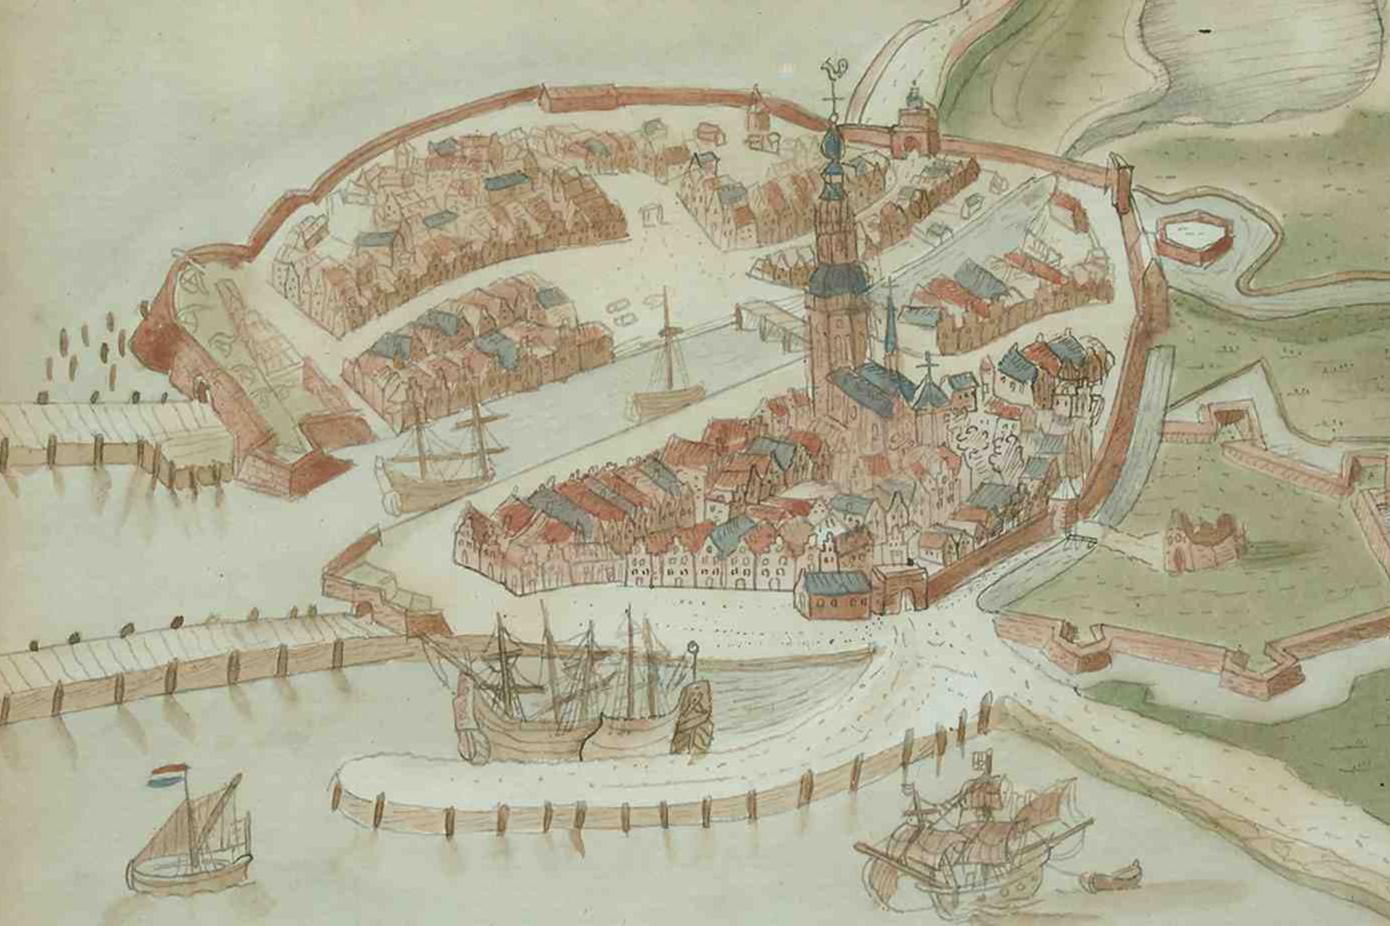 Image of ships at the port of Vlissingen